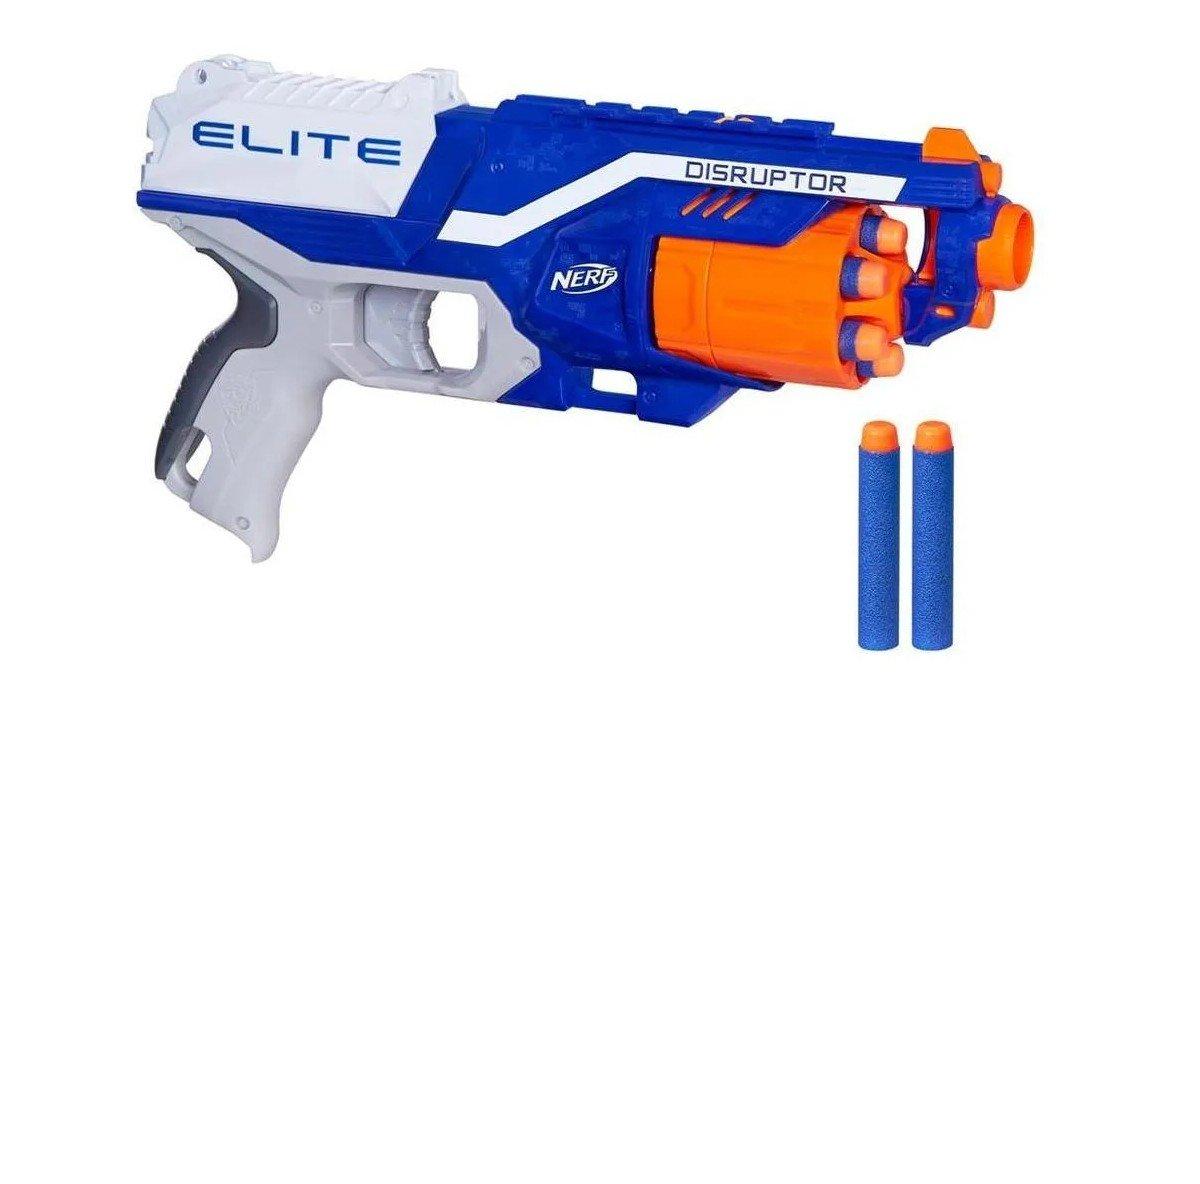 Lançador Nerf Elite Disruptor - Hasbro B9838